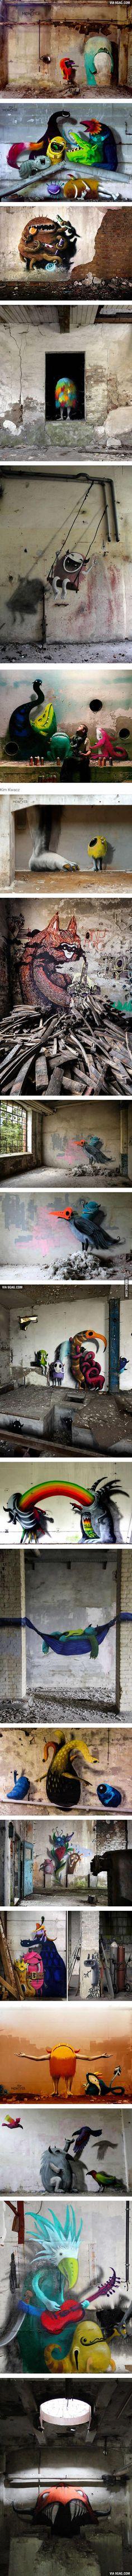 Artist Hides Monster Murals Inside Abandoned Buildings In Berlin (By Kim Kwacz)